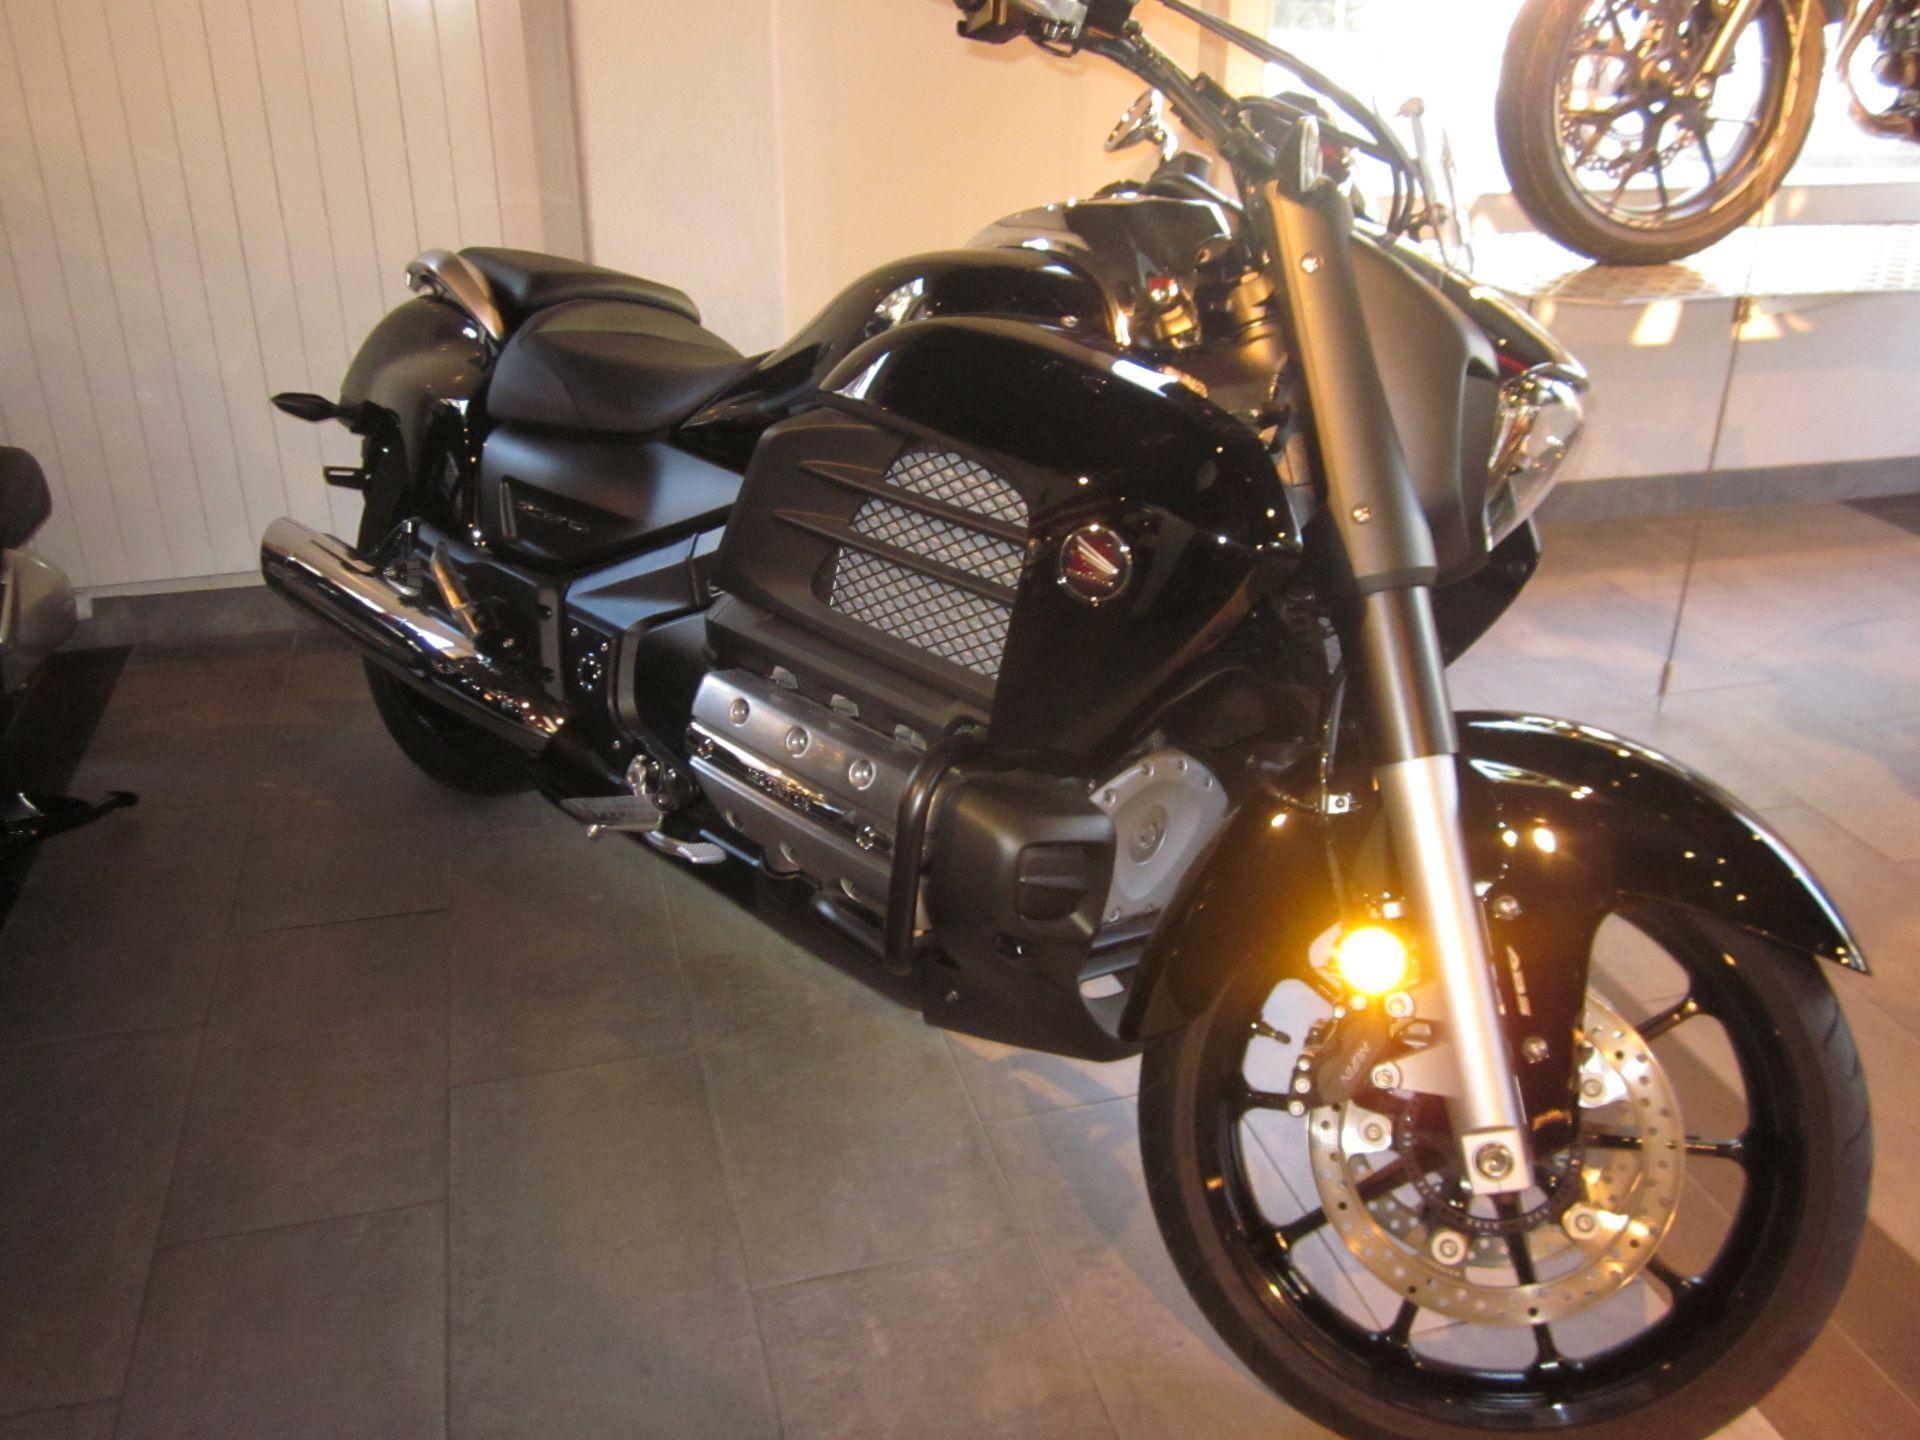 motorrad occasion kaufen honda gl 1800 c f6c abs michel motos lausanne. Black Bedroom Furniture Sets. Home Design Ideas